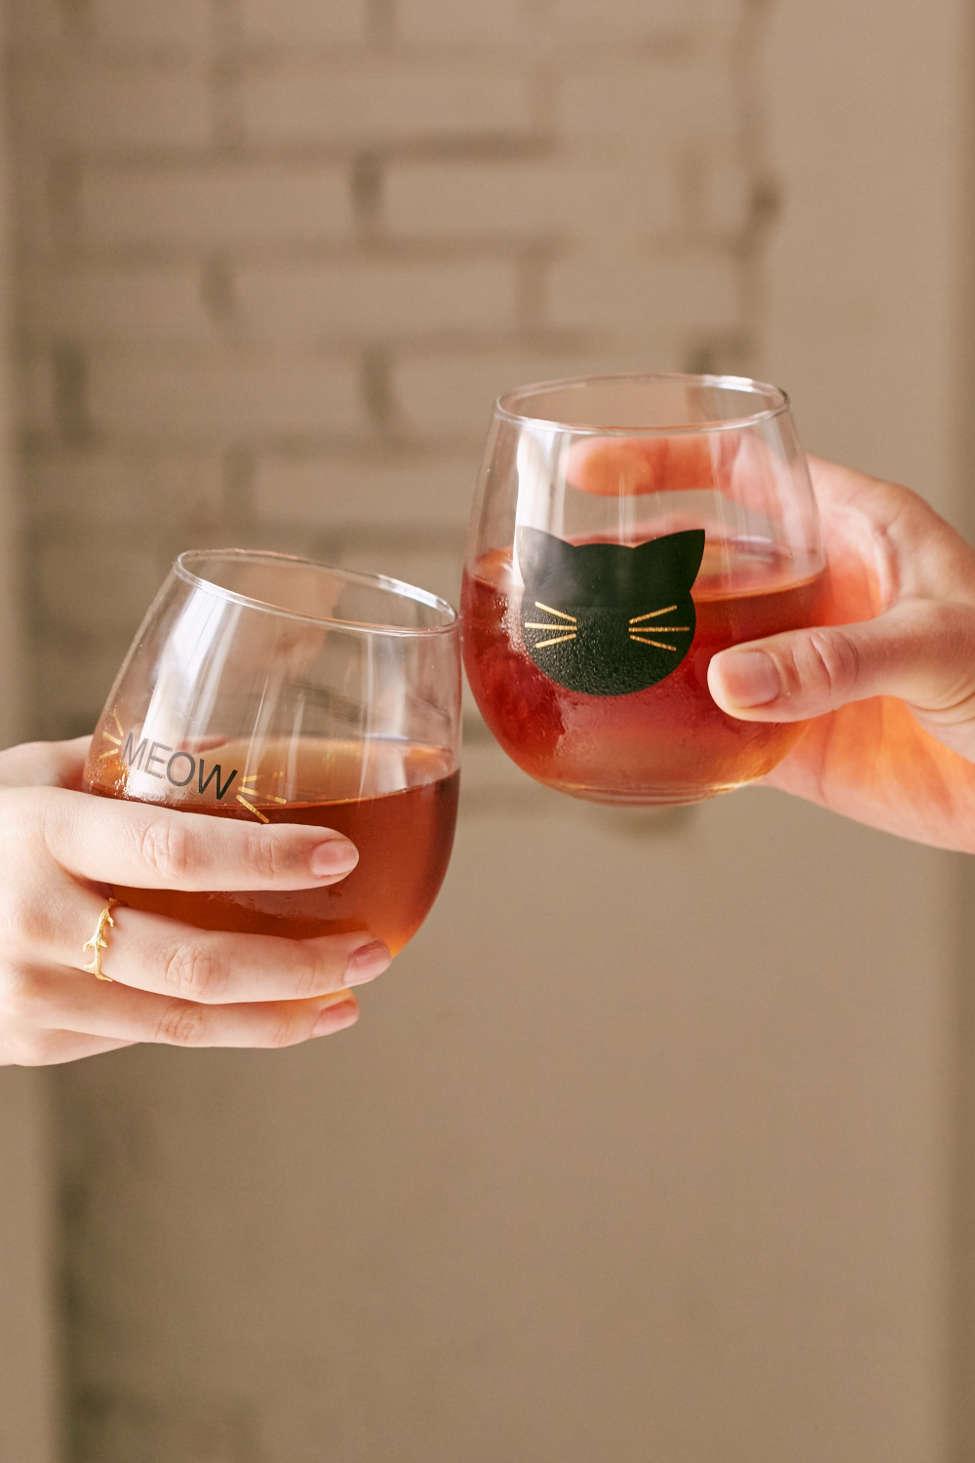 Meow Stemless Wine Glass Set